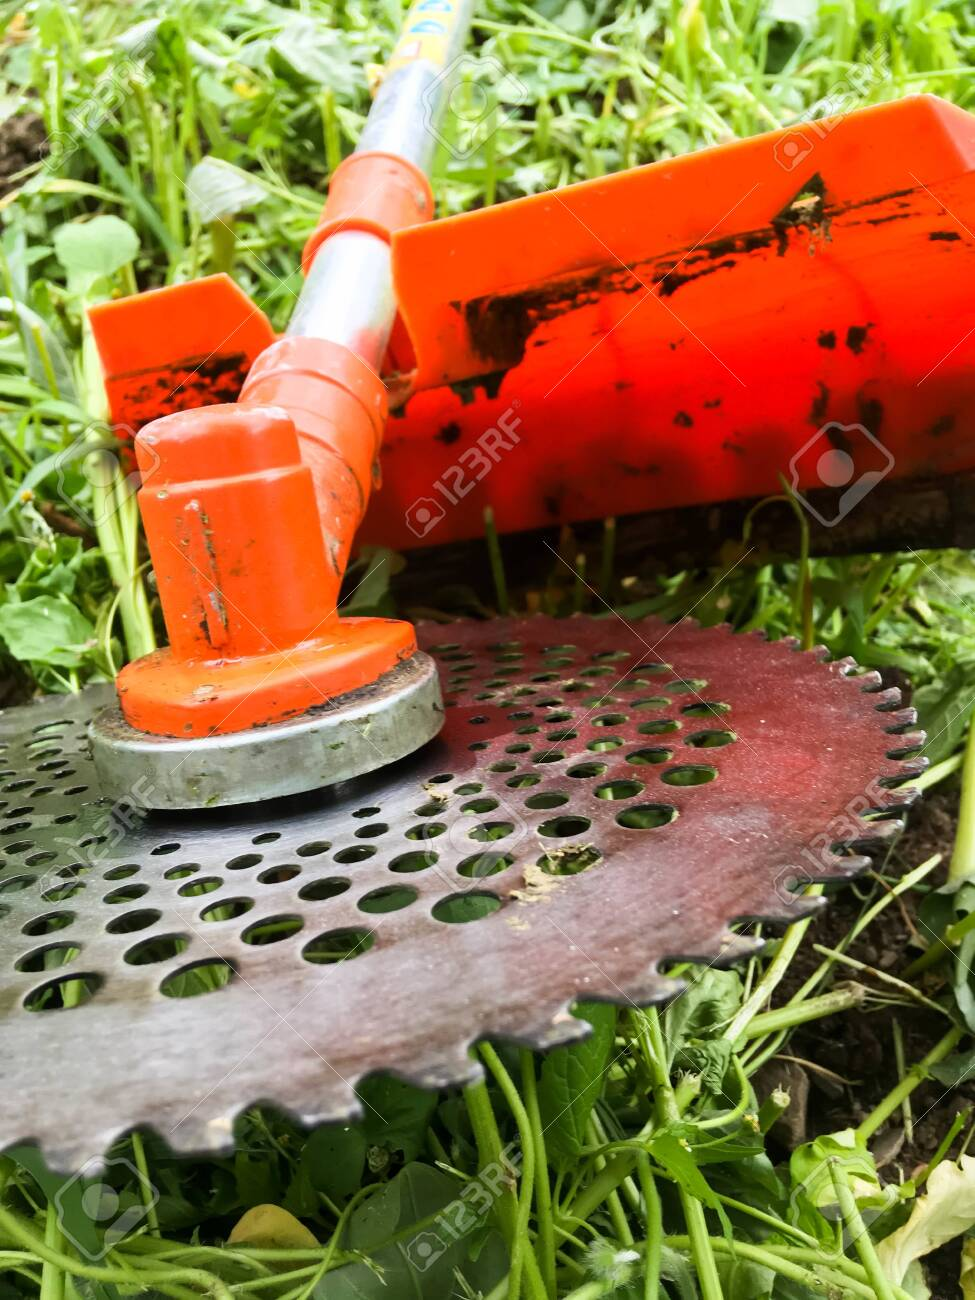 Lawn mower, grass, equipment, mow gardener care work tool - 147697641